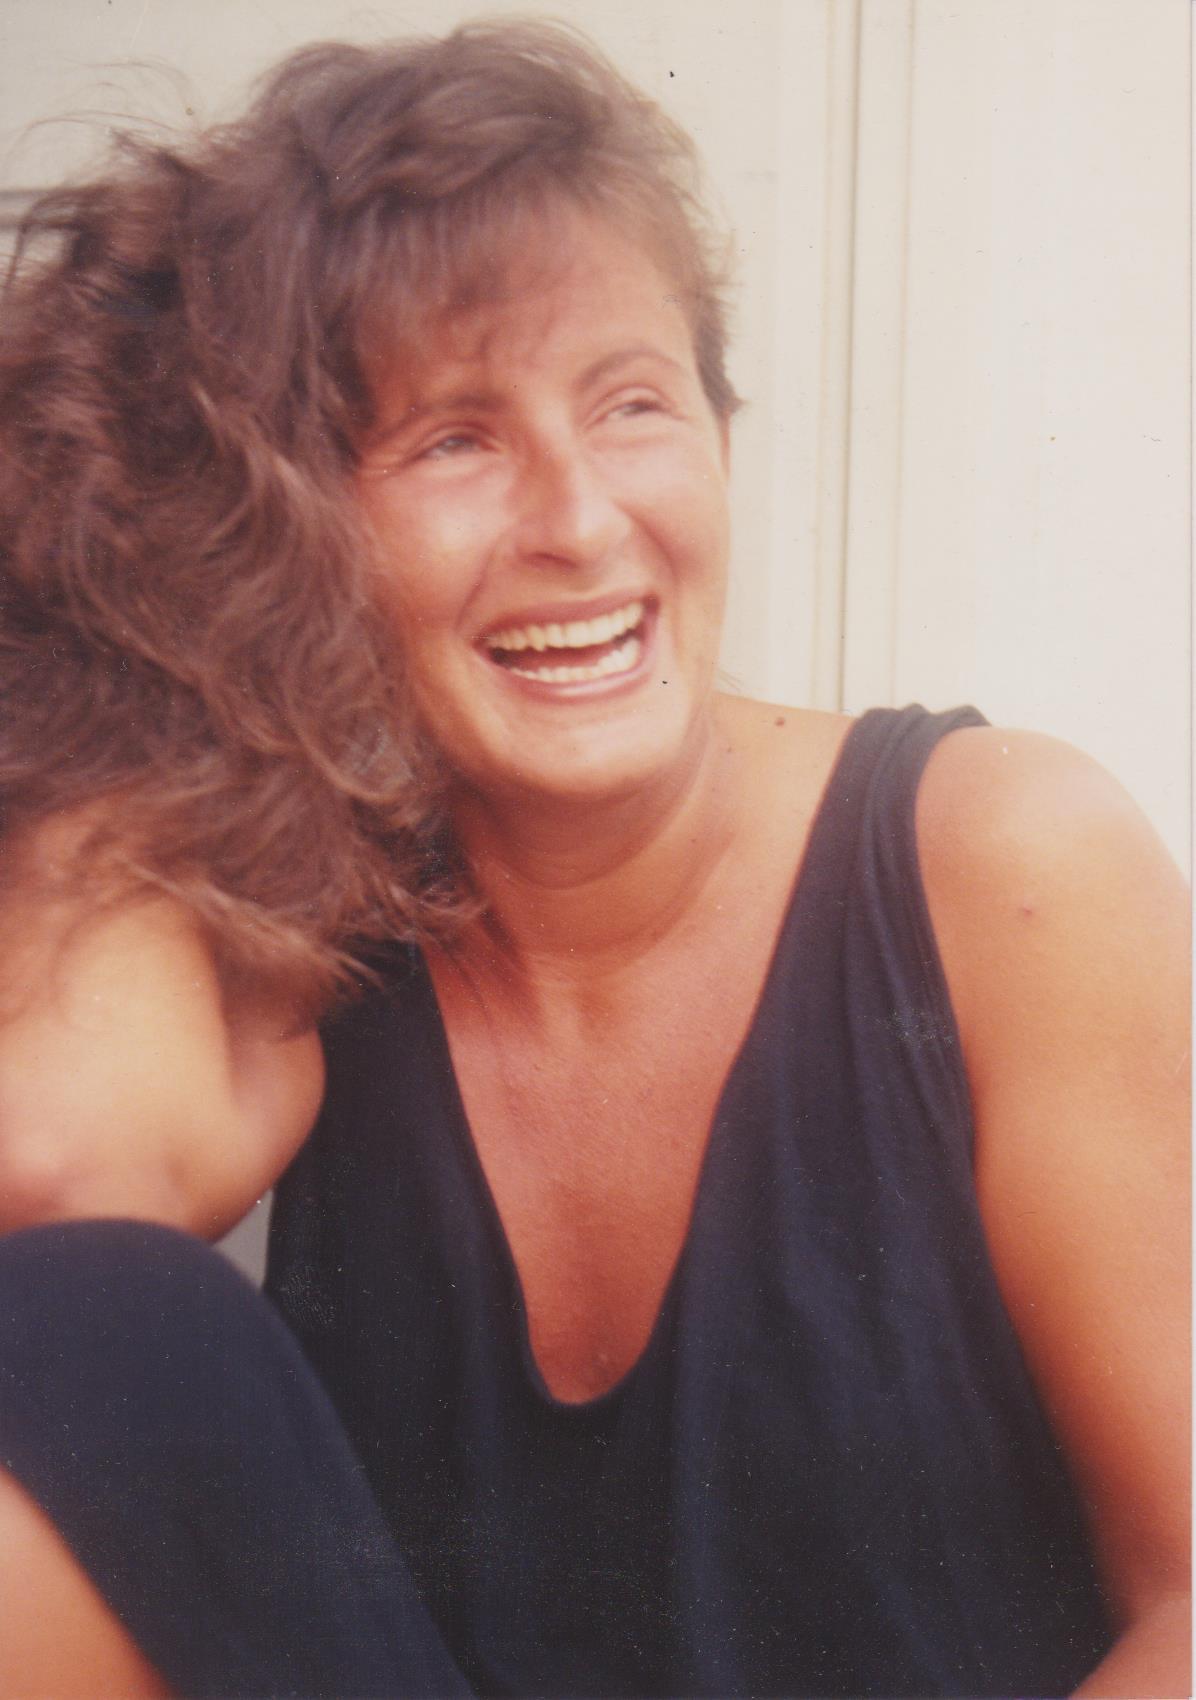 Amelia Belloni Sonzogni